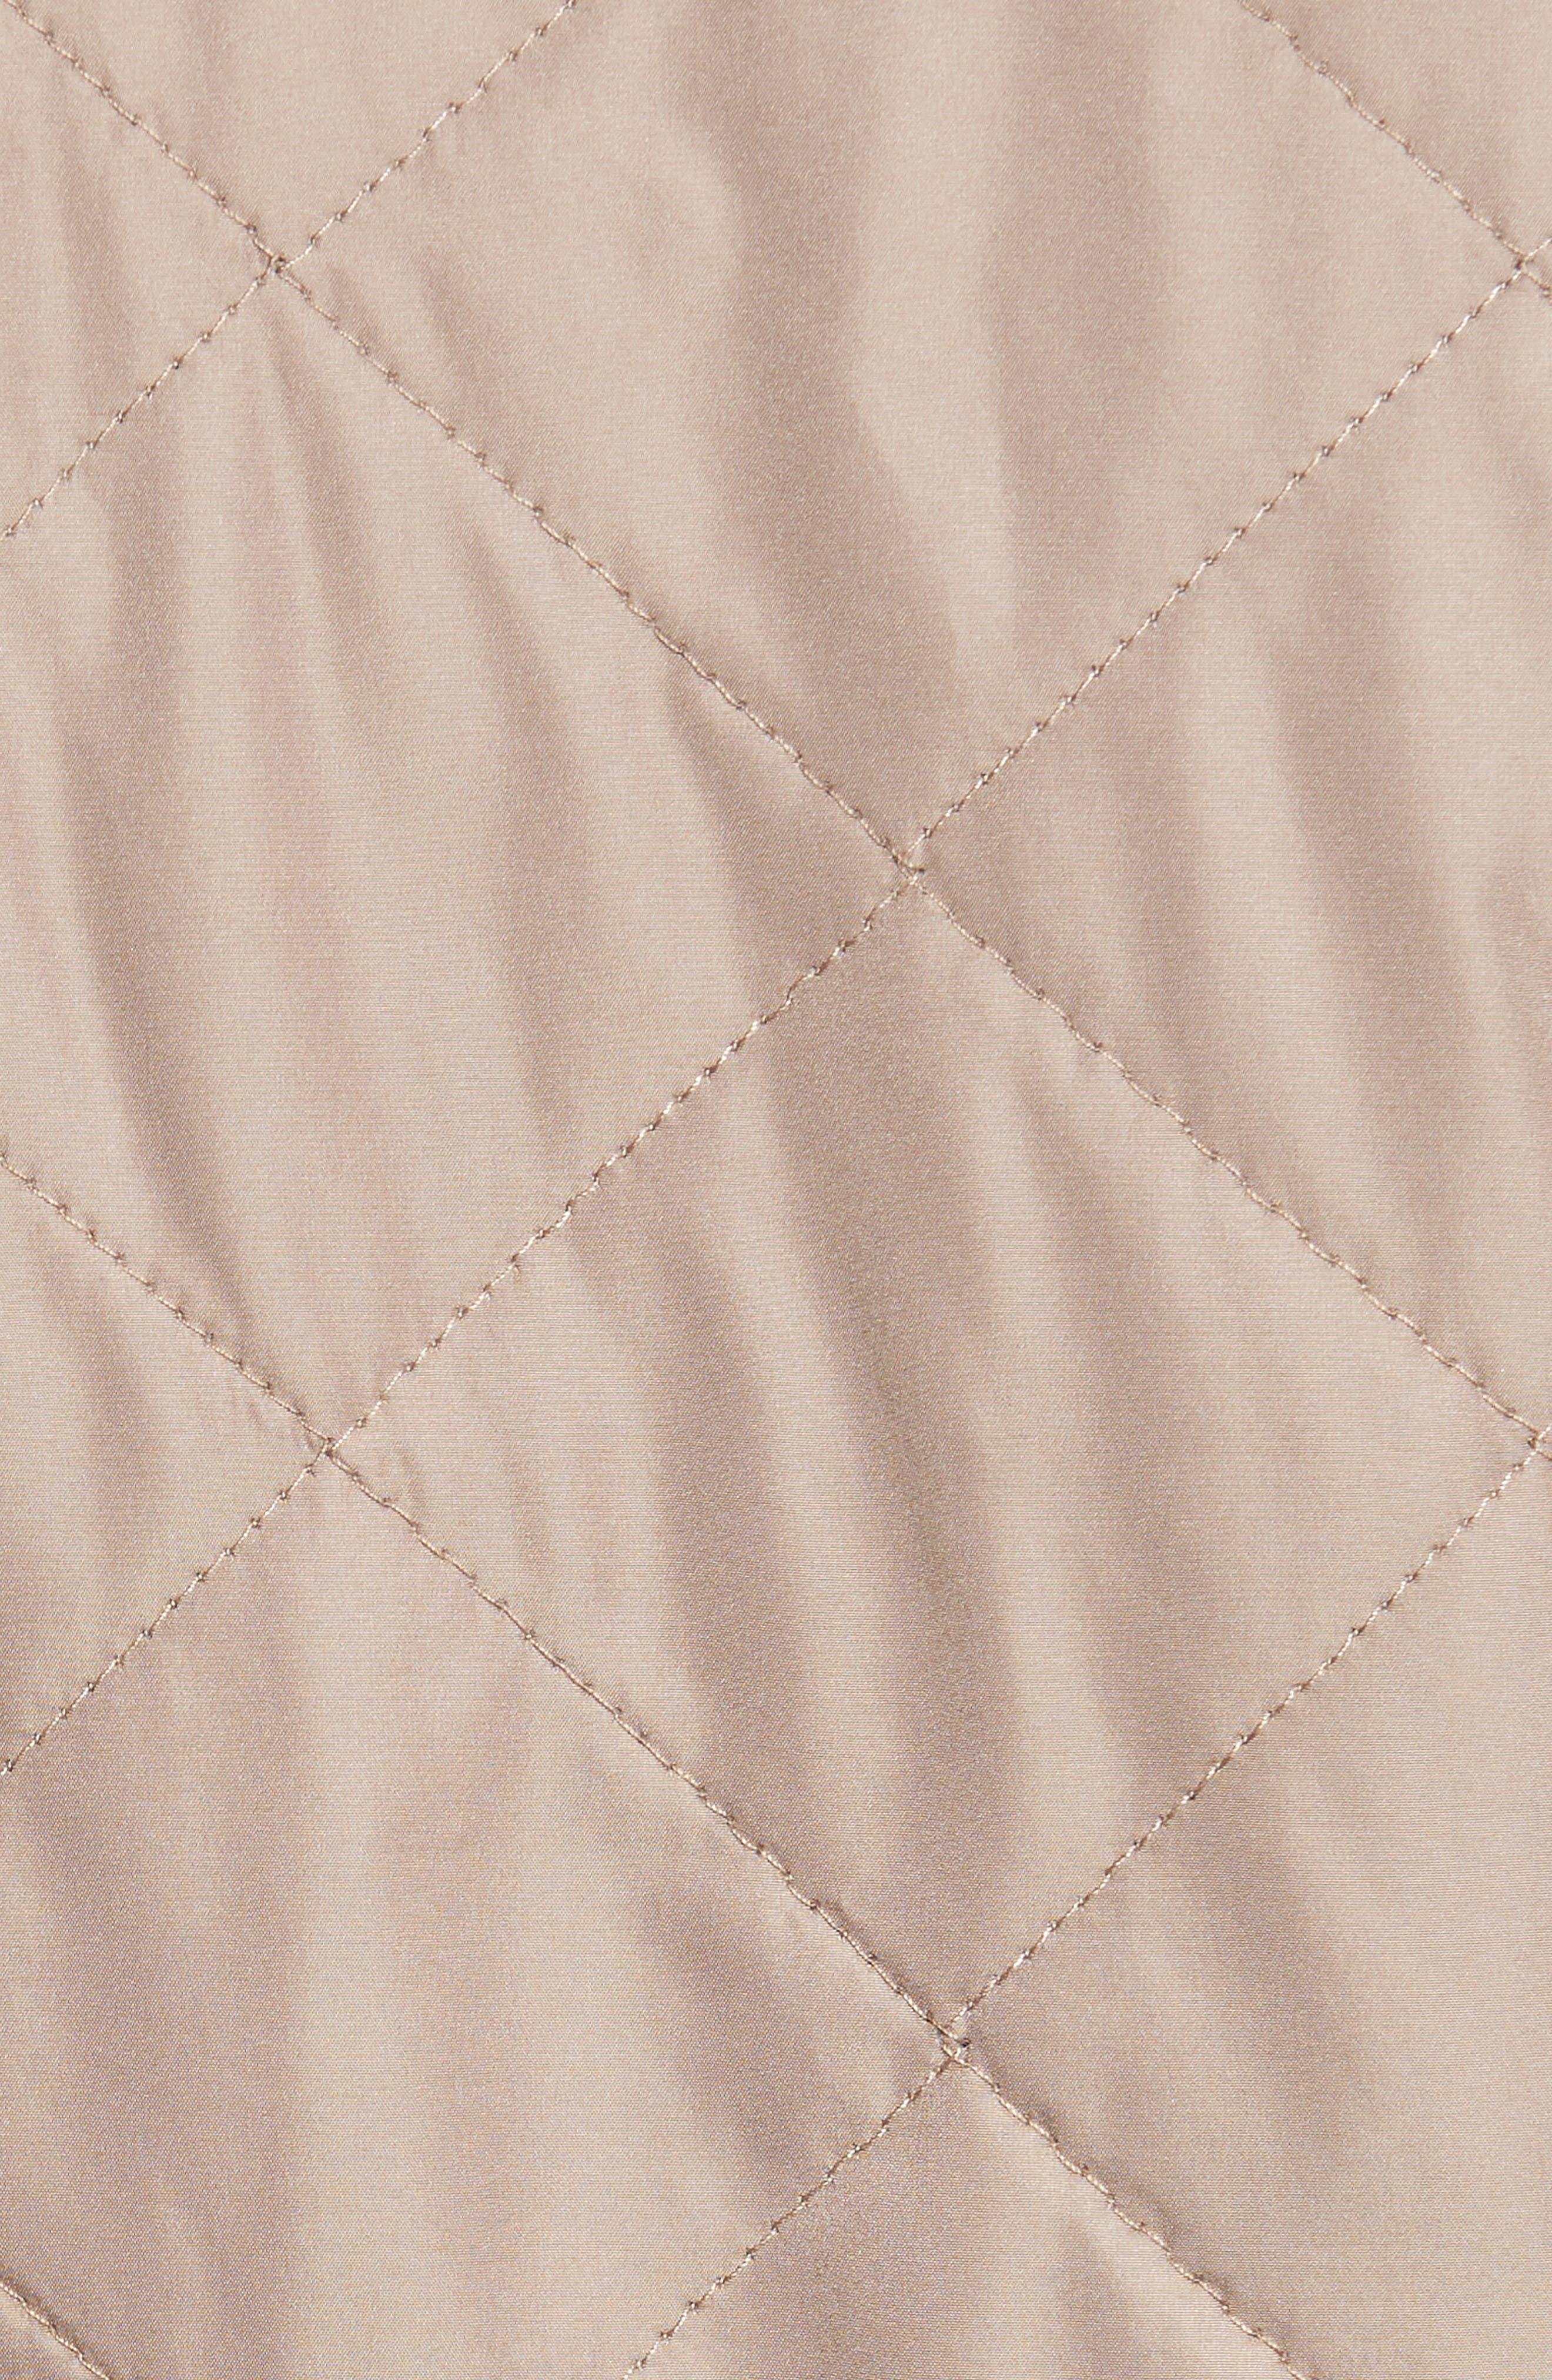 Reversible Fleece Lined Quilted Vest,                             Alternate thumbnail 8, color,                             MUSHROOM